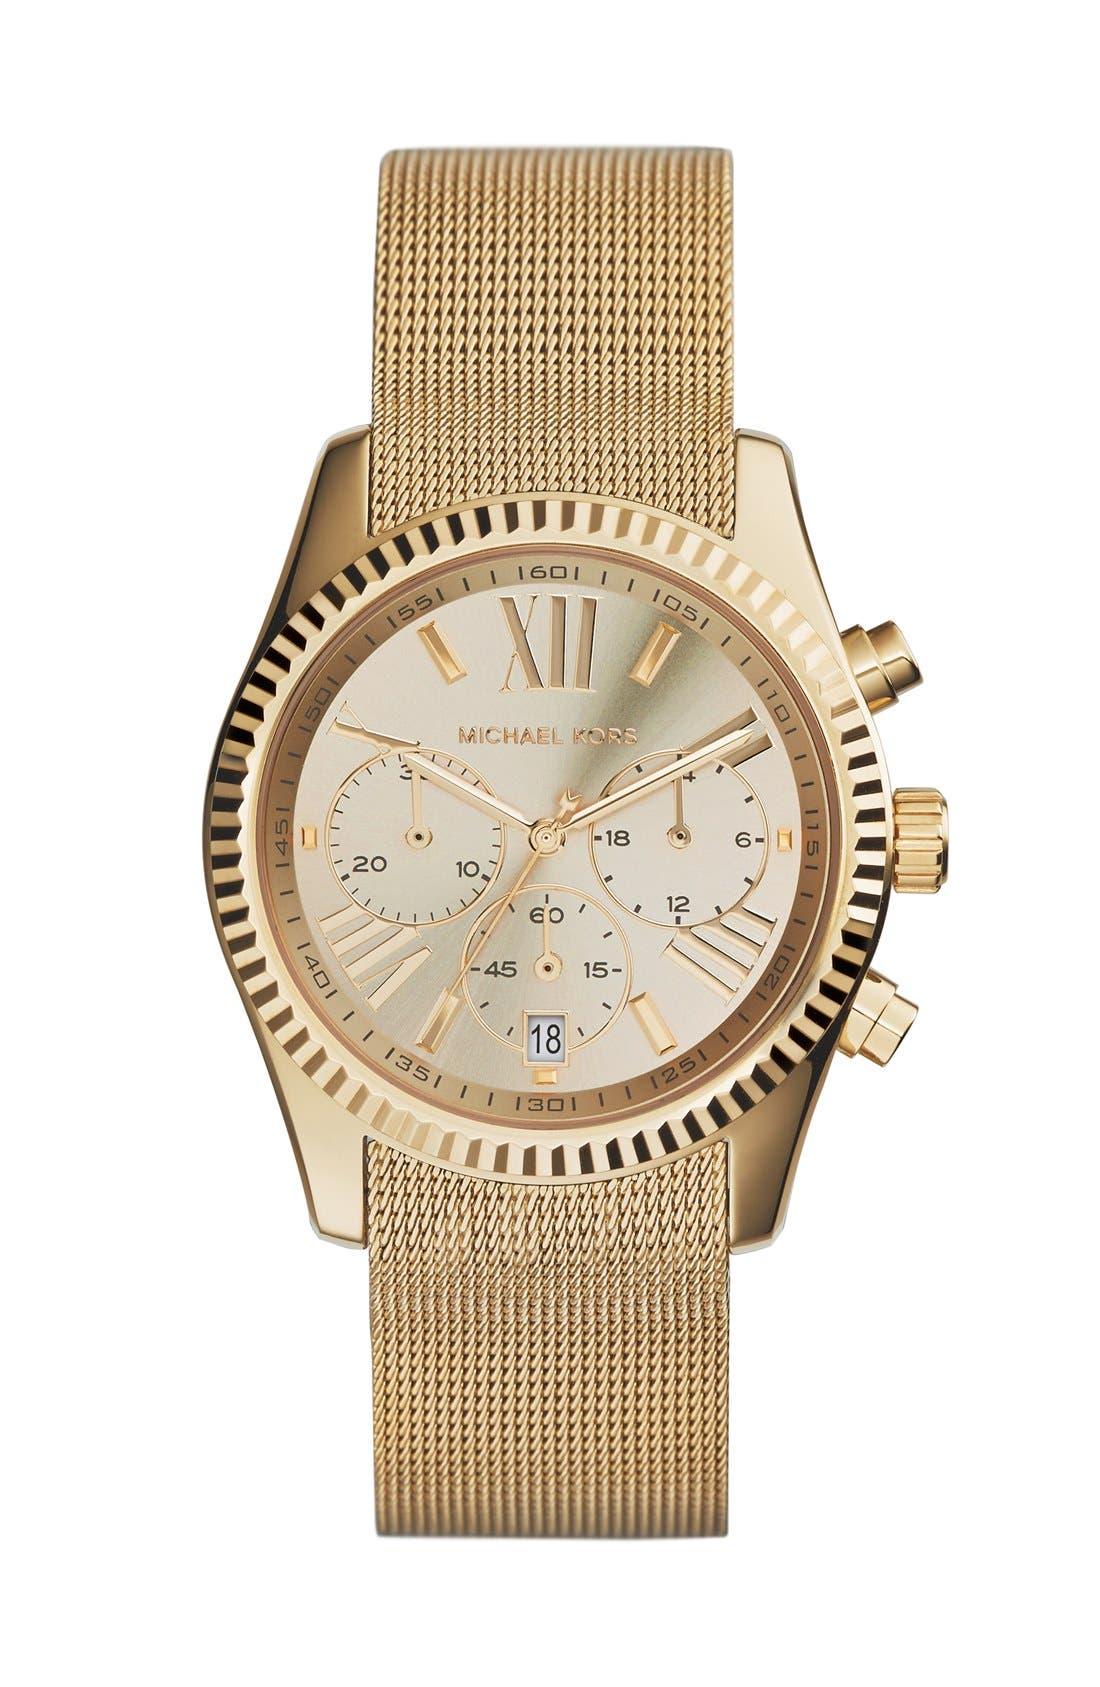 Main Image - Michael Kors 'Lexington' Chronograph Mesh Strap Watch, 37mm